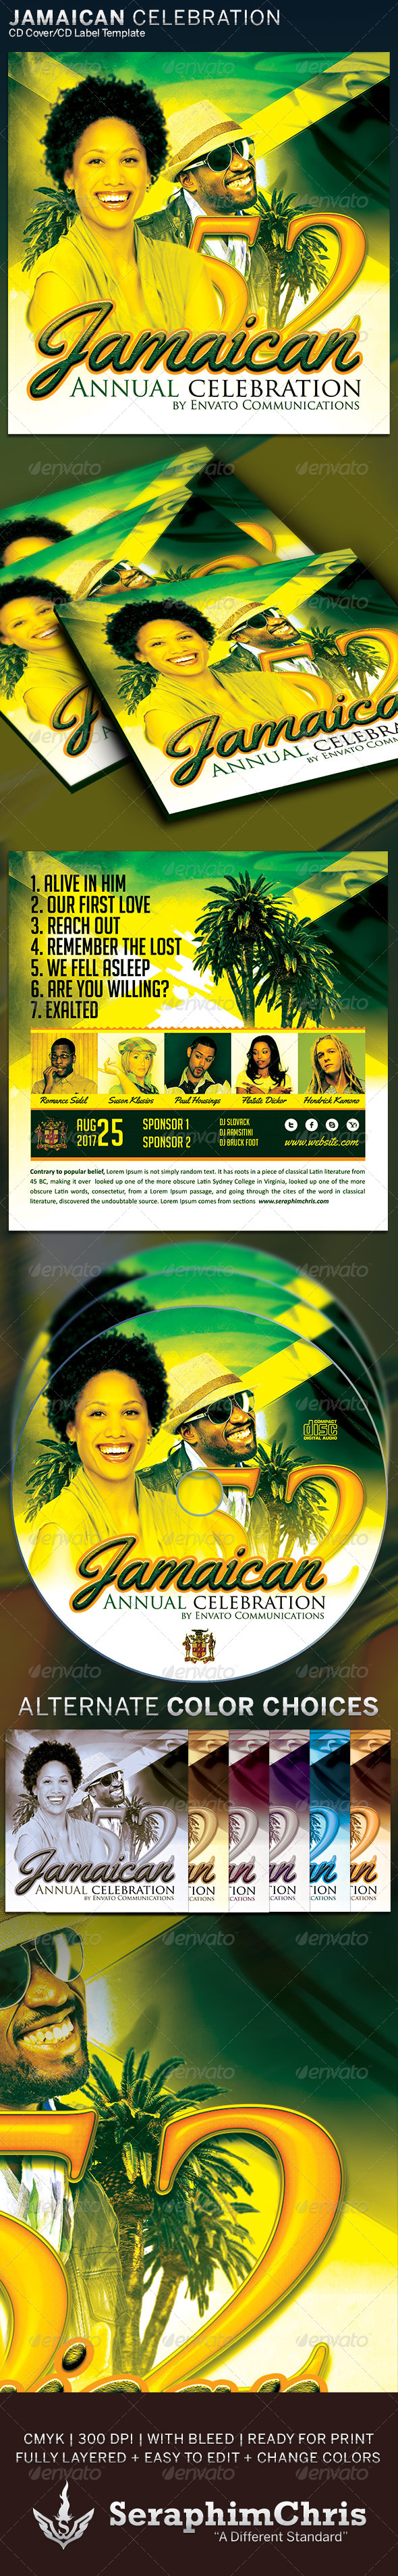 GraphicRiver Jamaican Celebration CD Cover Artwork Template 6326786